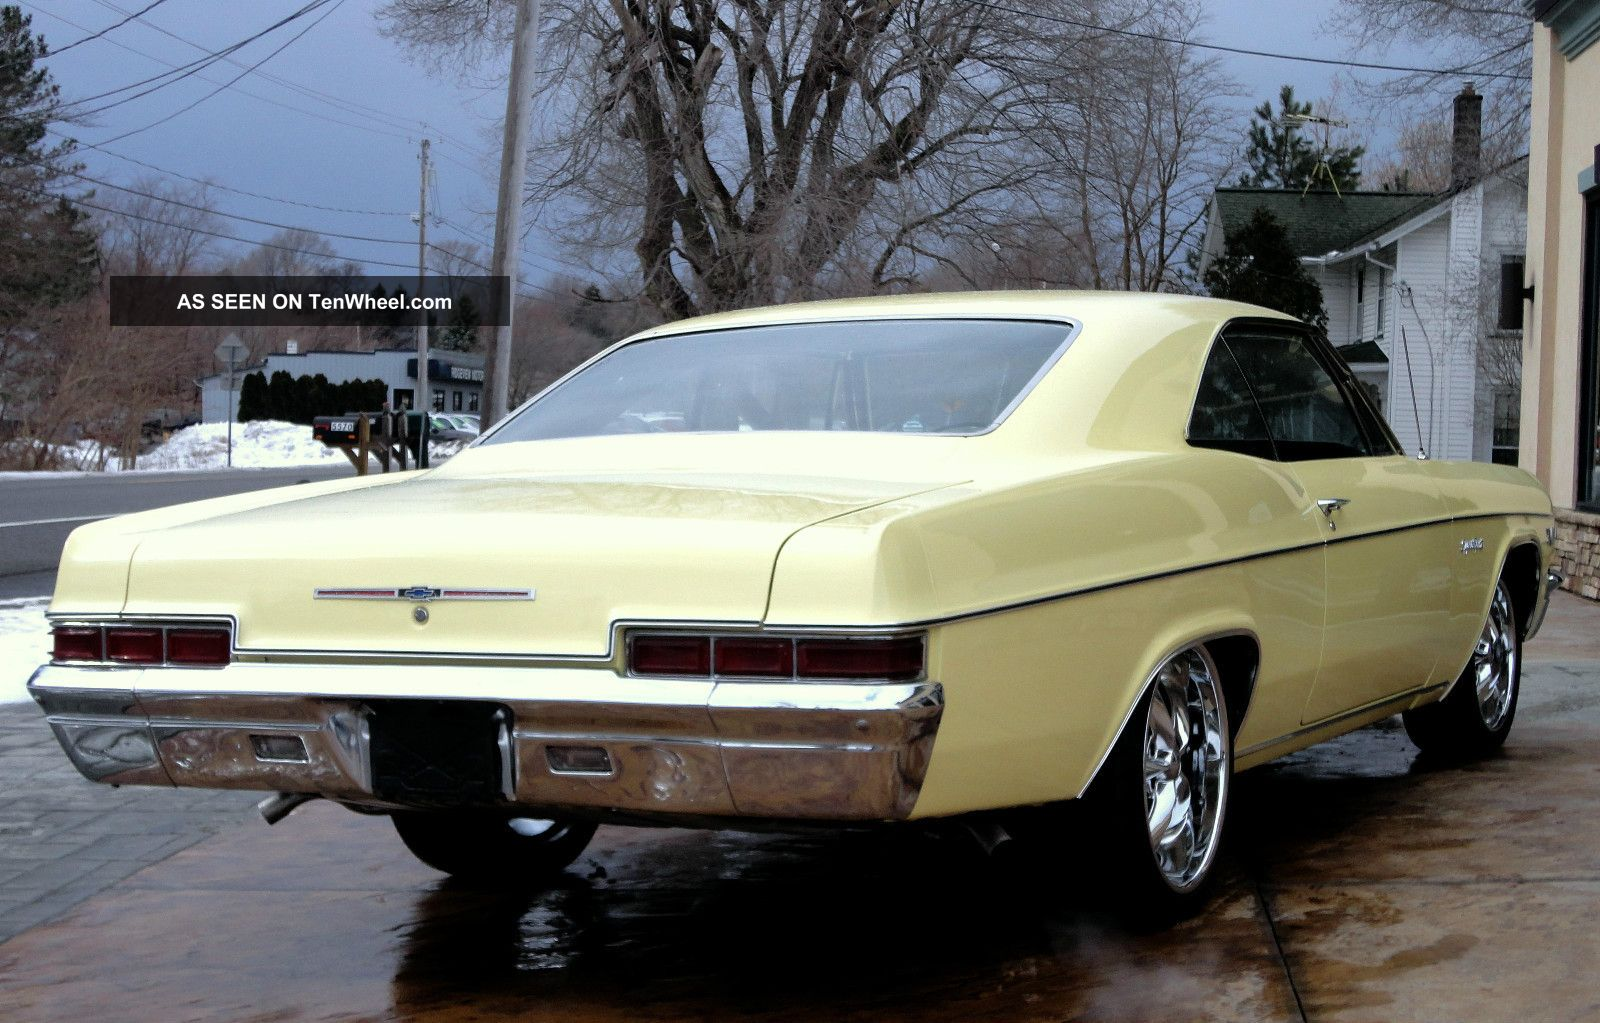 1966 Chevy Impala Ss Lowered Big Block Foose Wheels